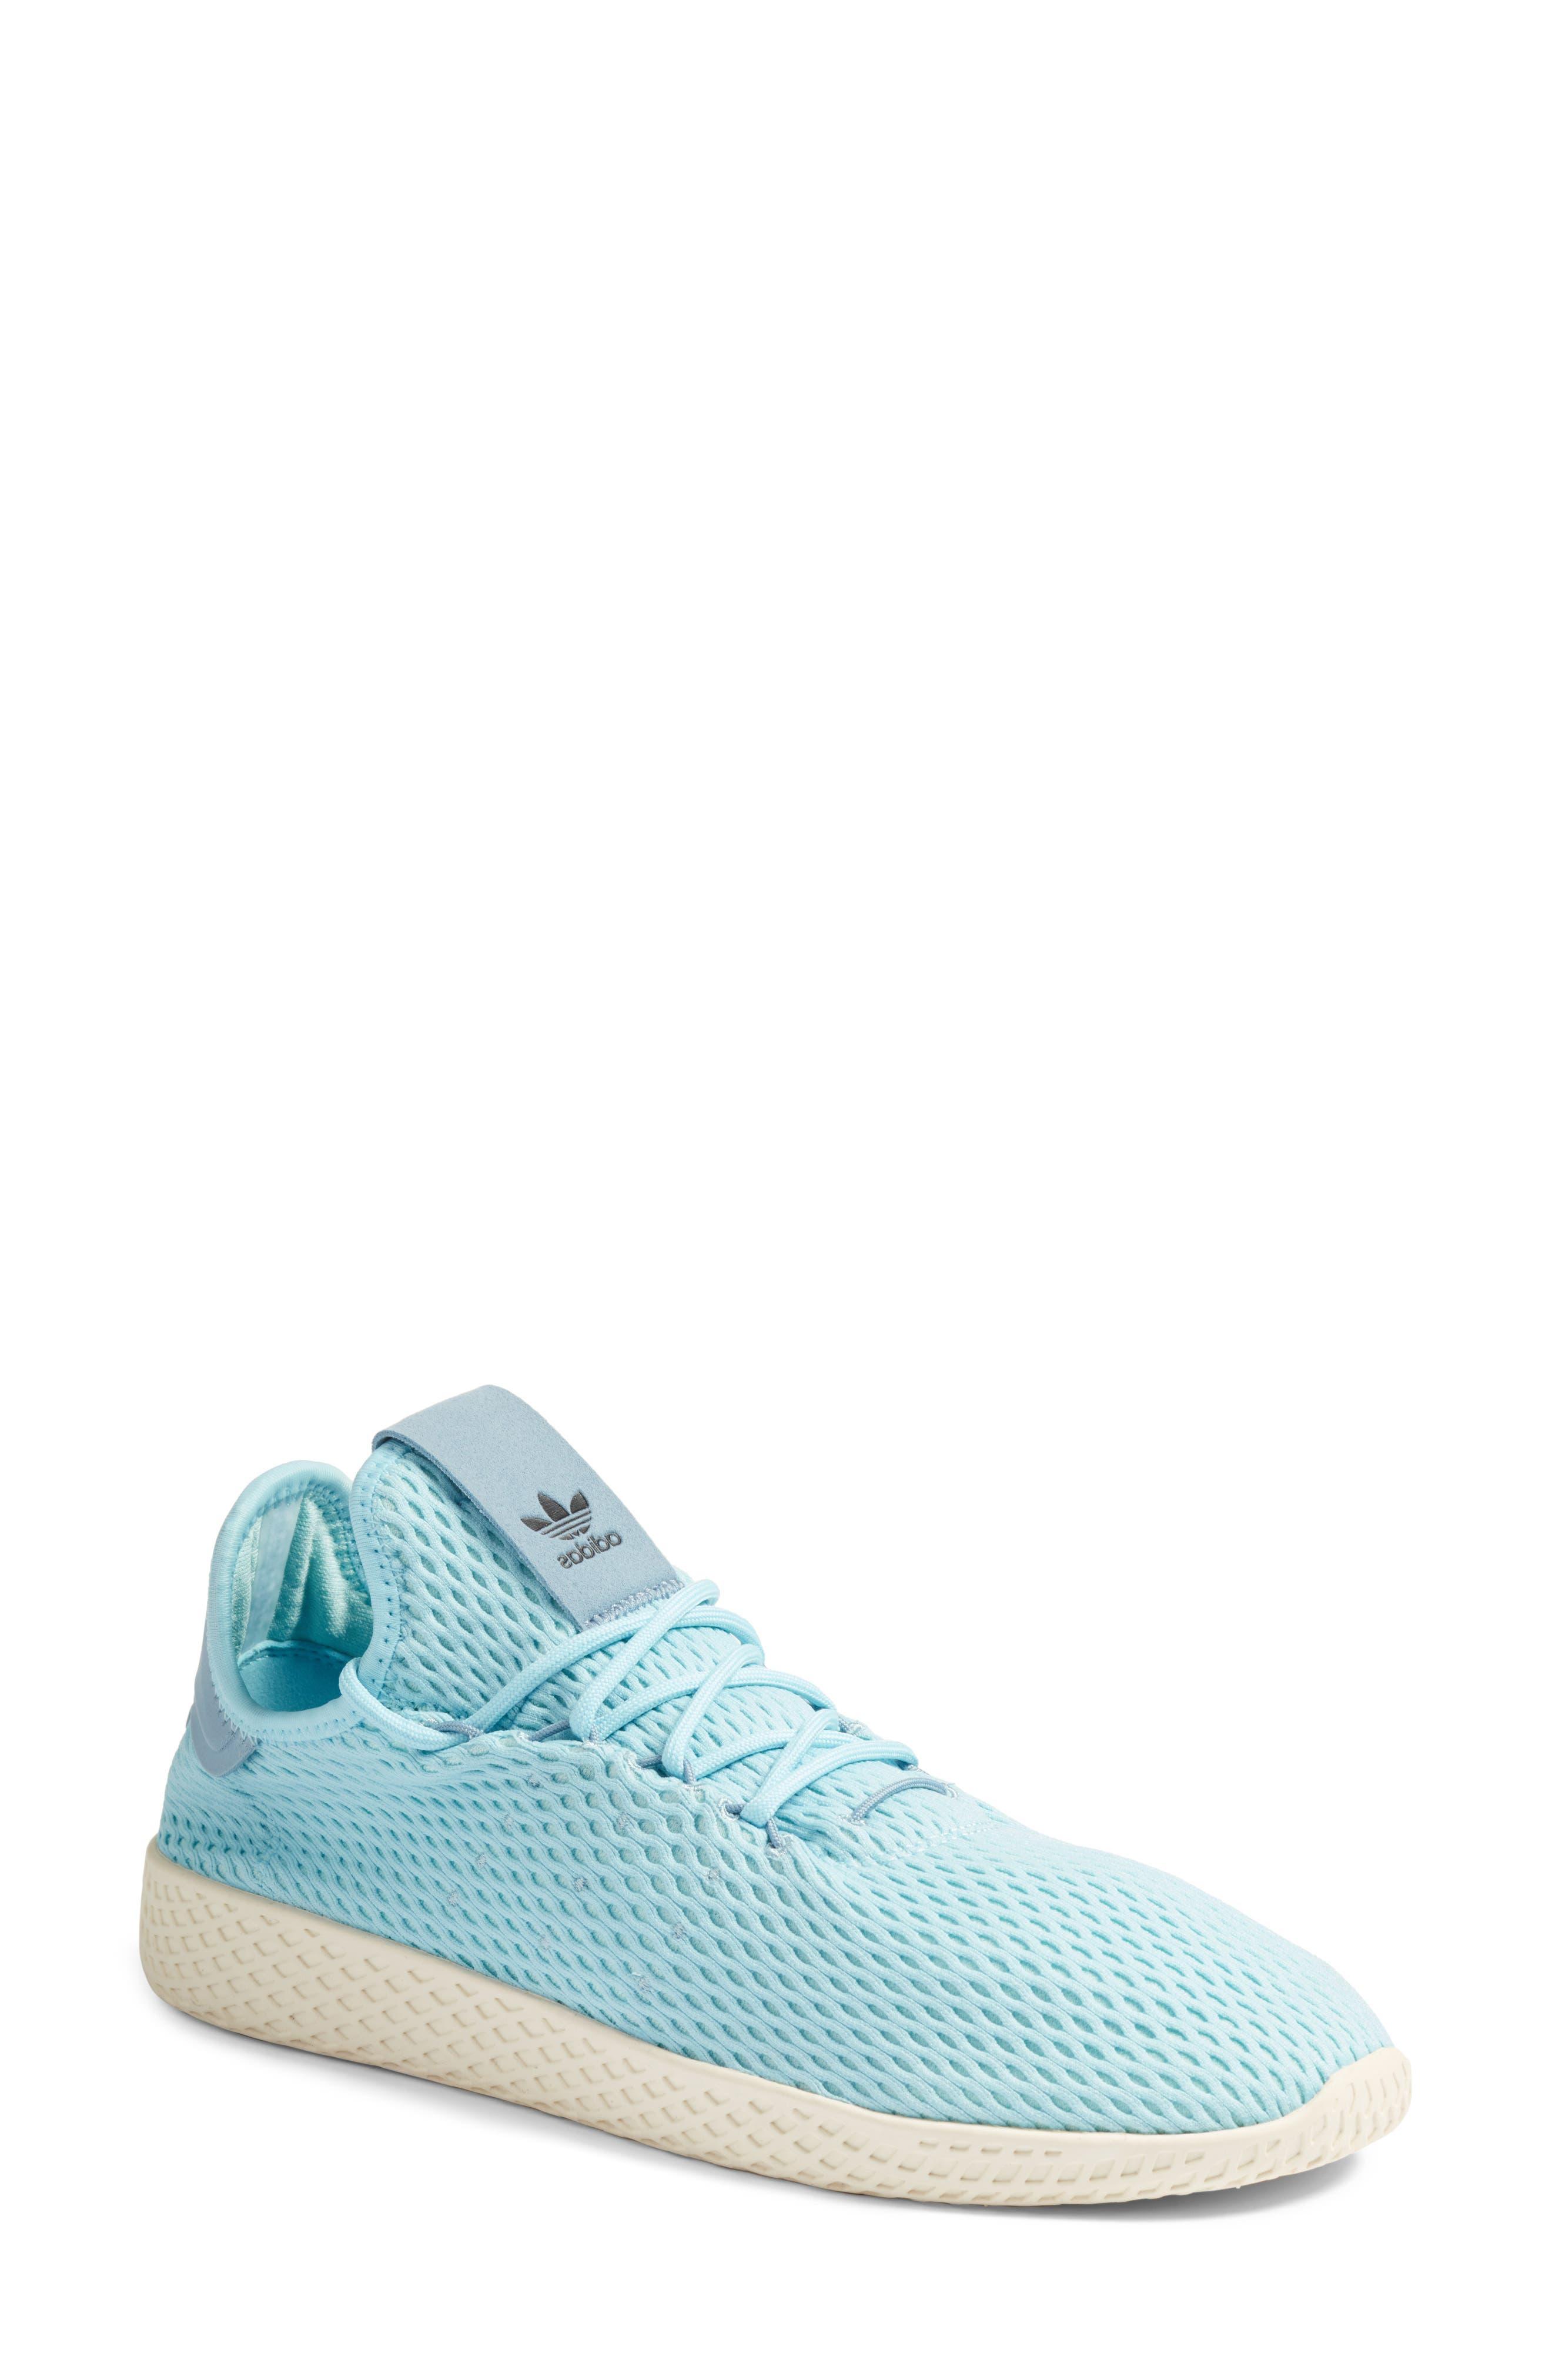 adidas Pharrell Williams Tennis Hu Sneaker (Women)